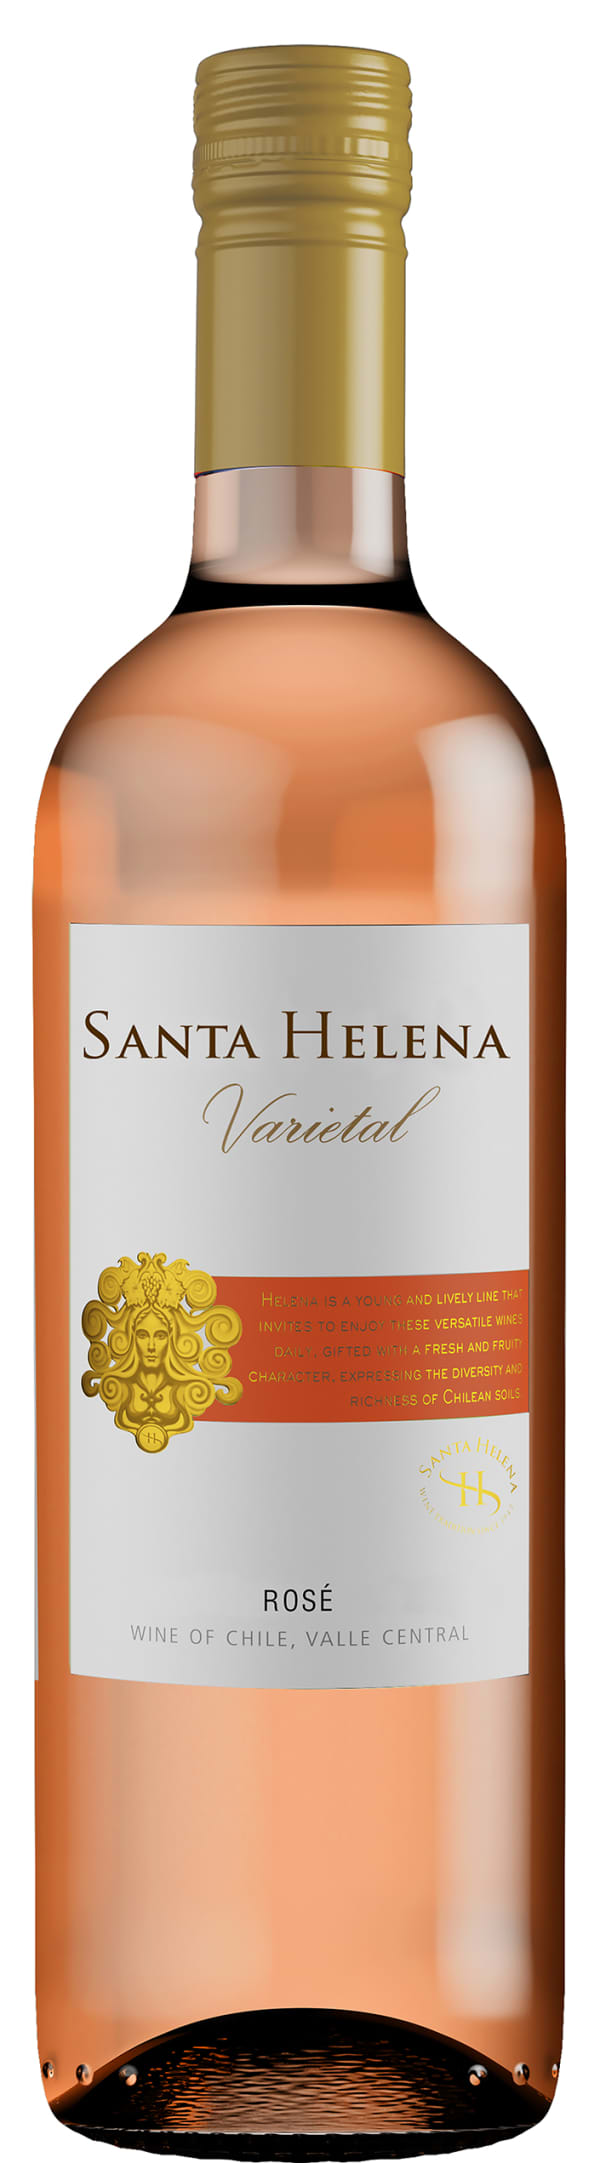 Santa Helena Varietal Rosé 2017